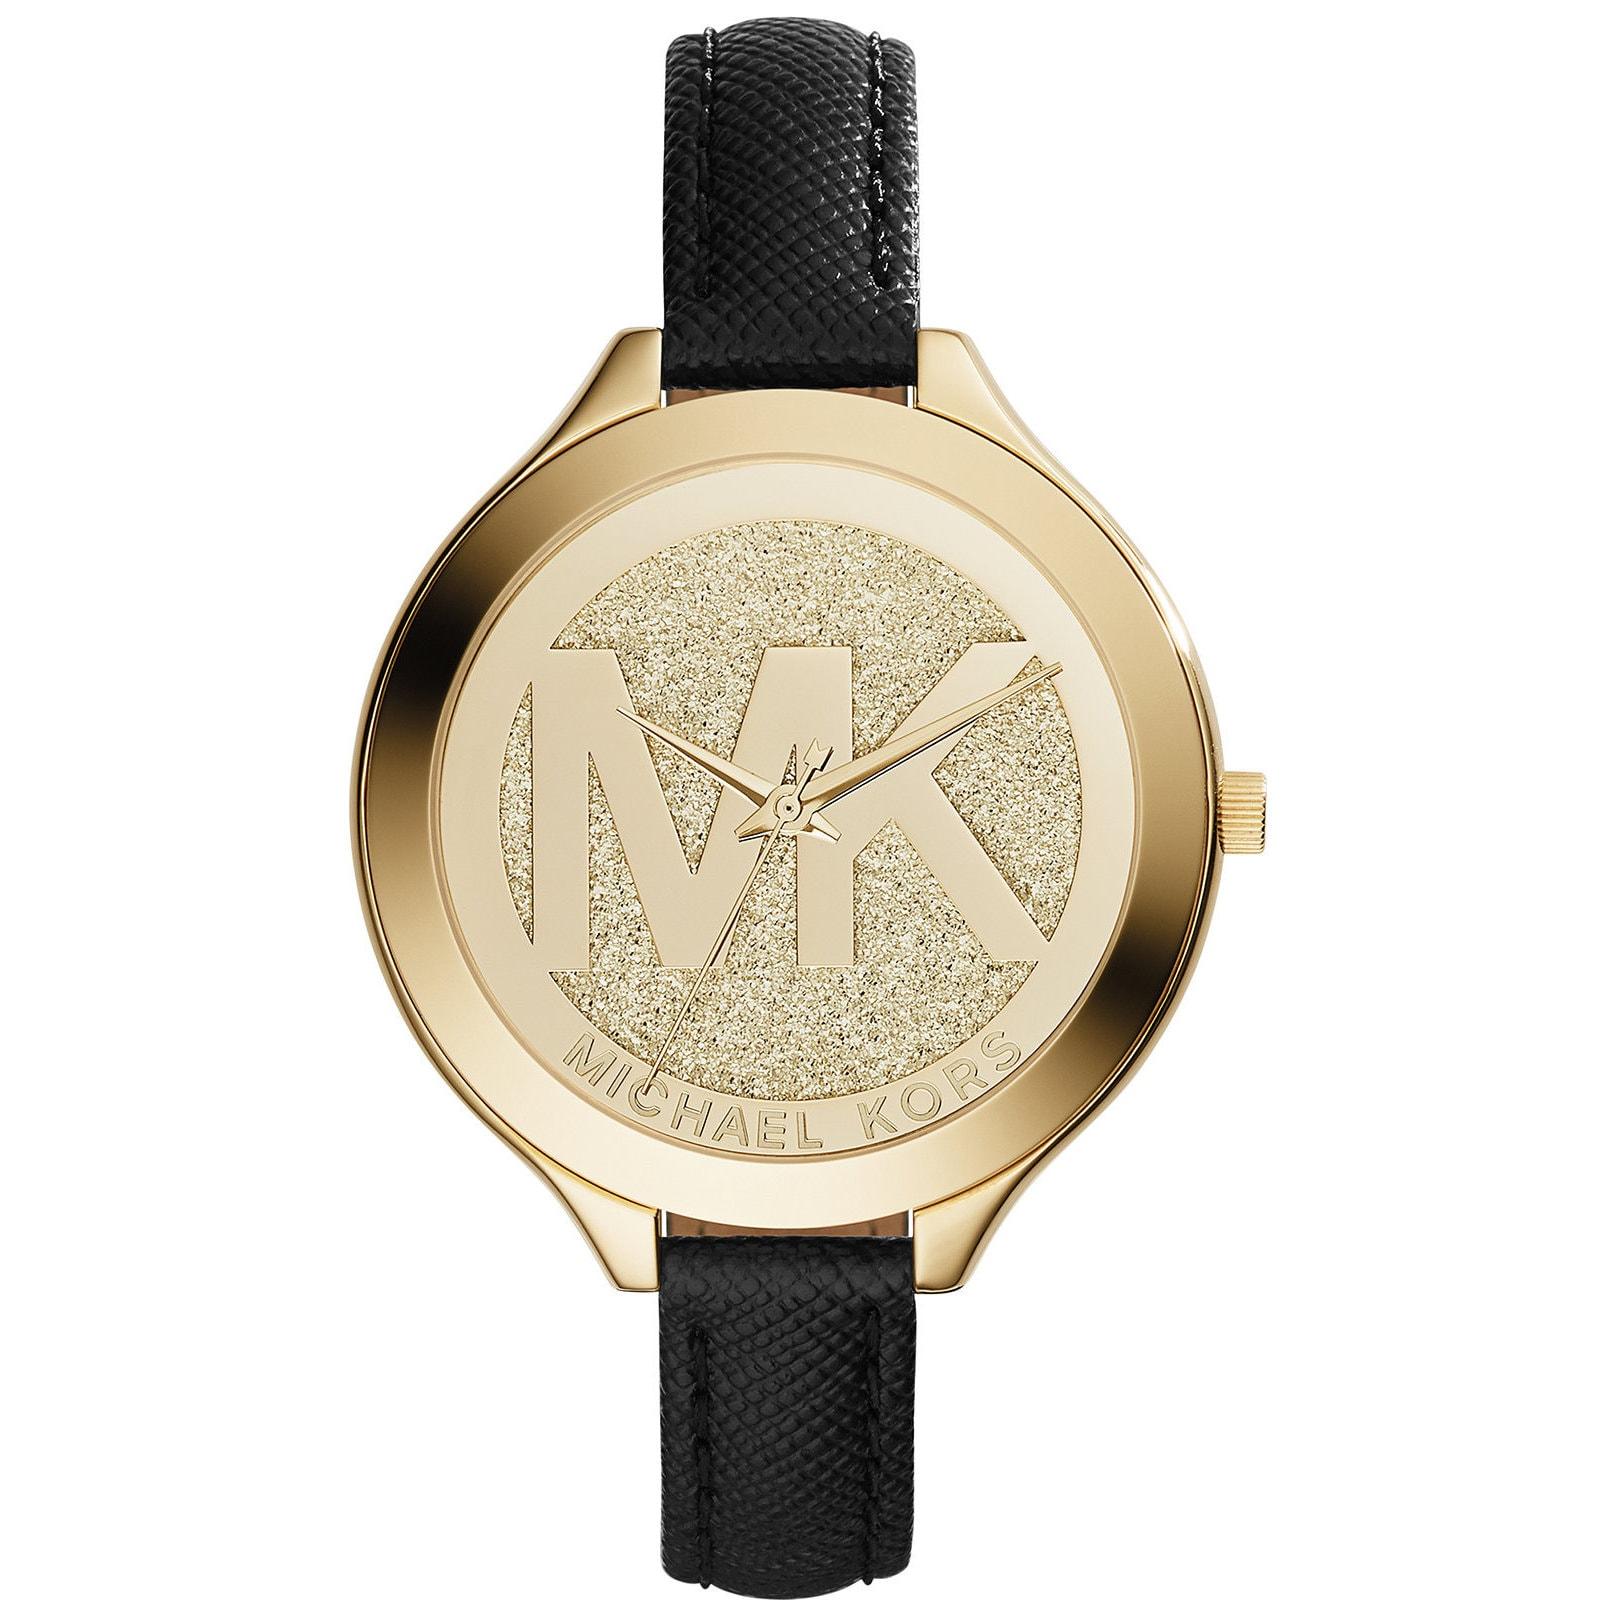 Michael Kors Womens MK2392 Slim Runway Gold Dial Black Leather Watch MK2392